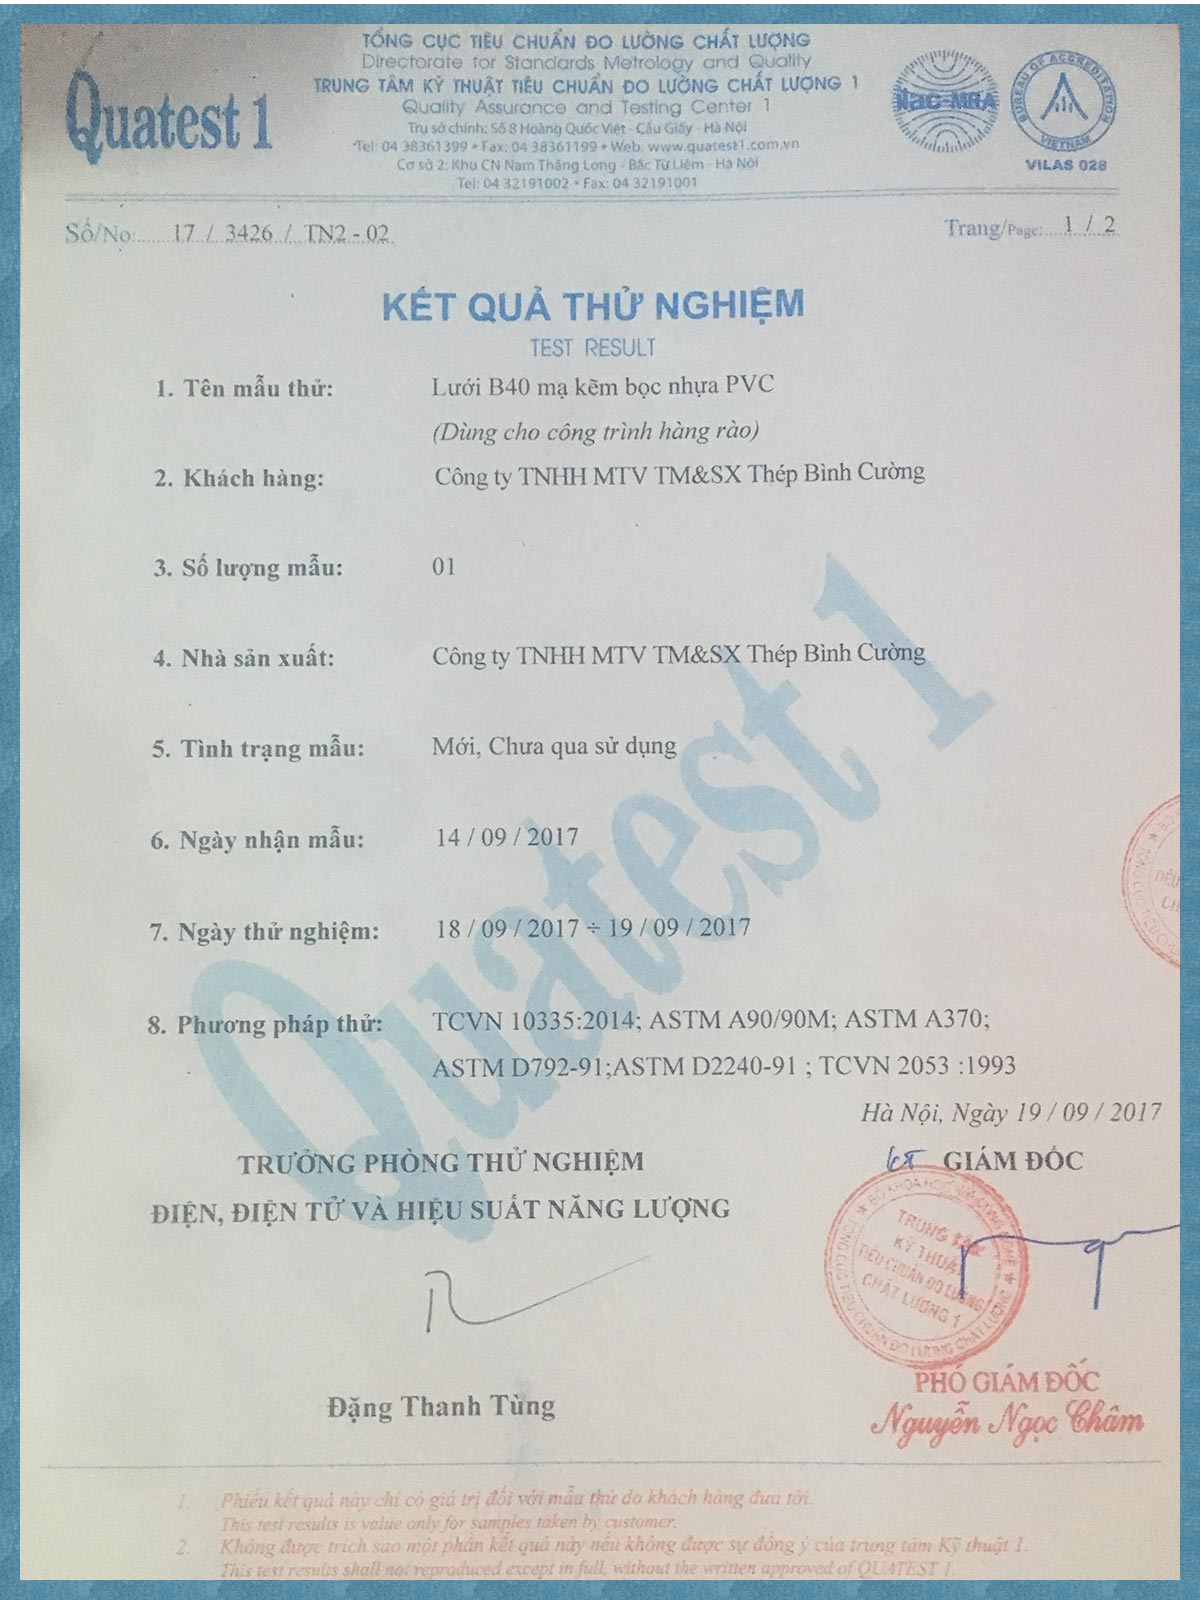 chungchi-luoiB40-ma-kem-boc-nhua-PVC